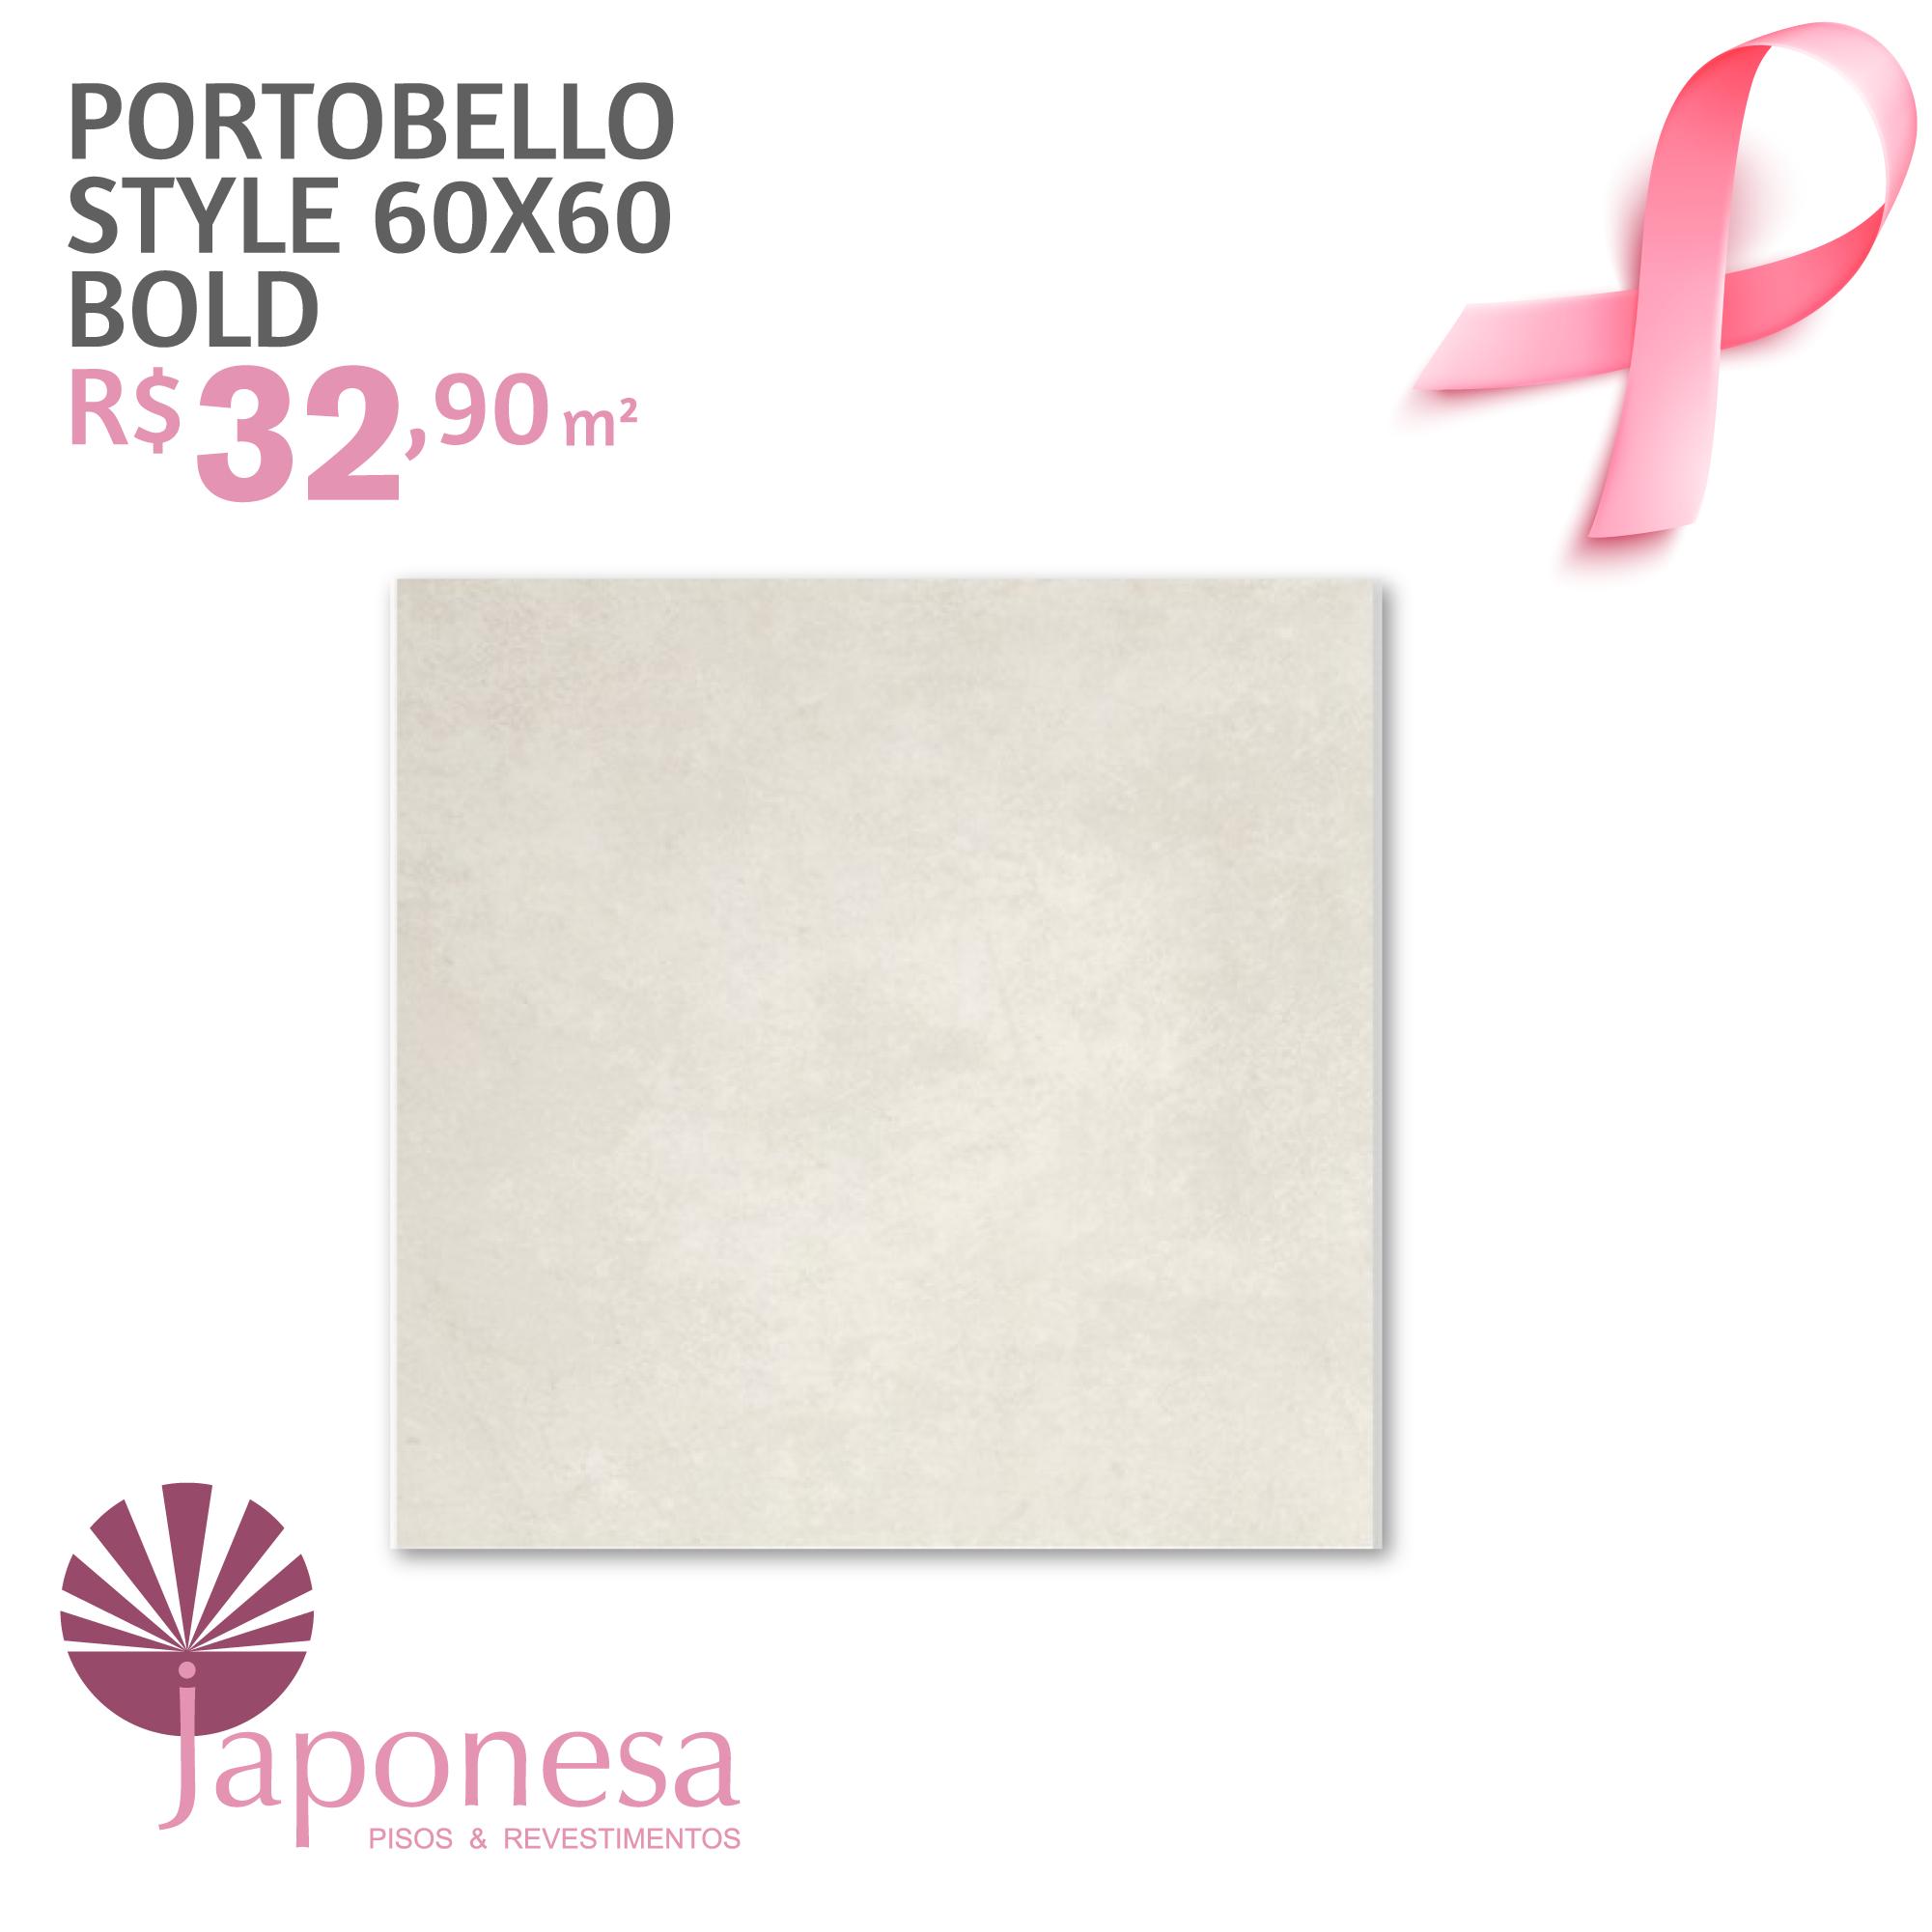 Portobello Style 60×60 Bold